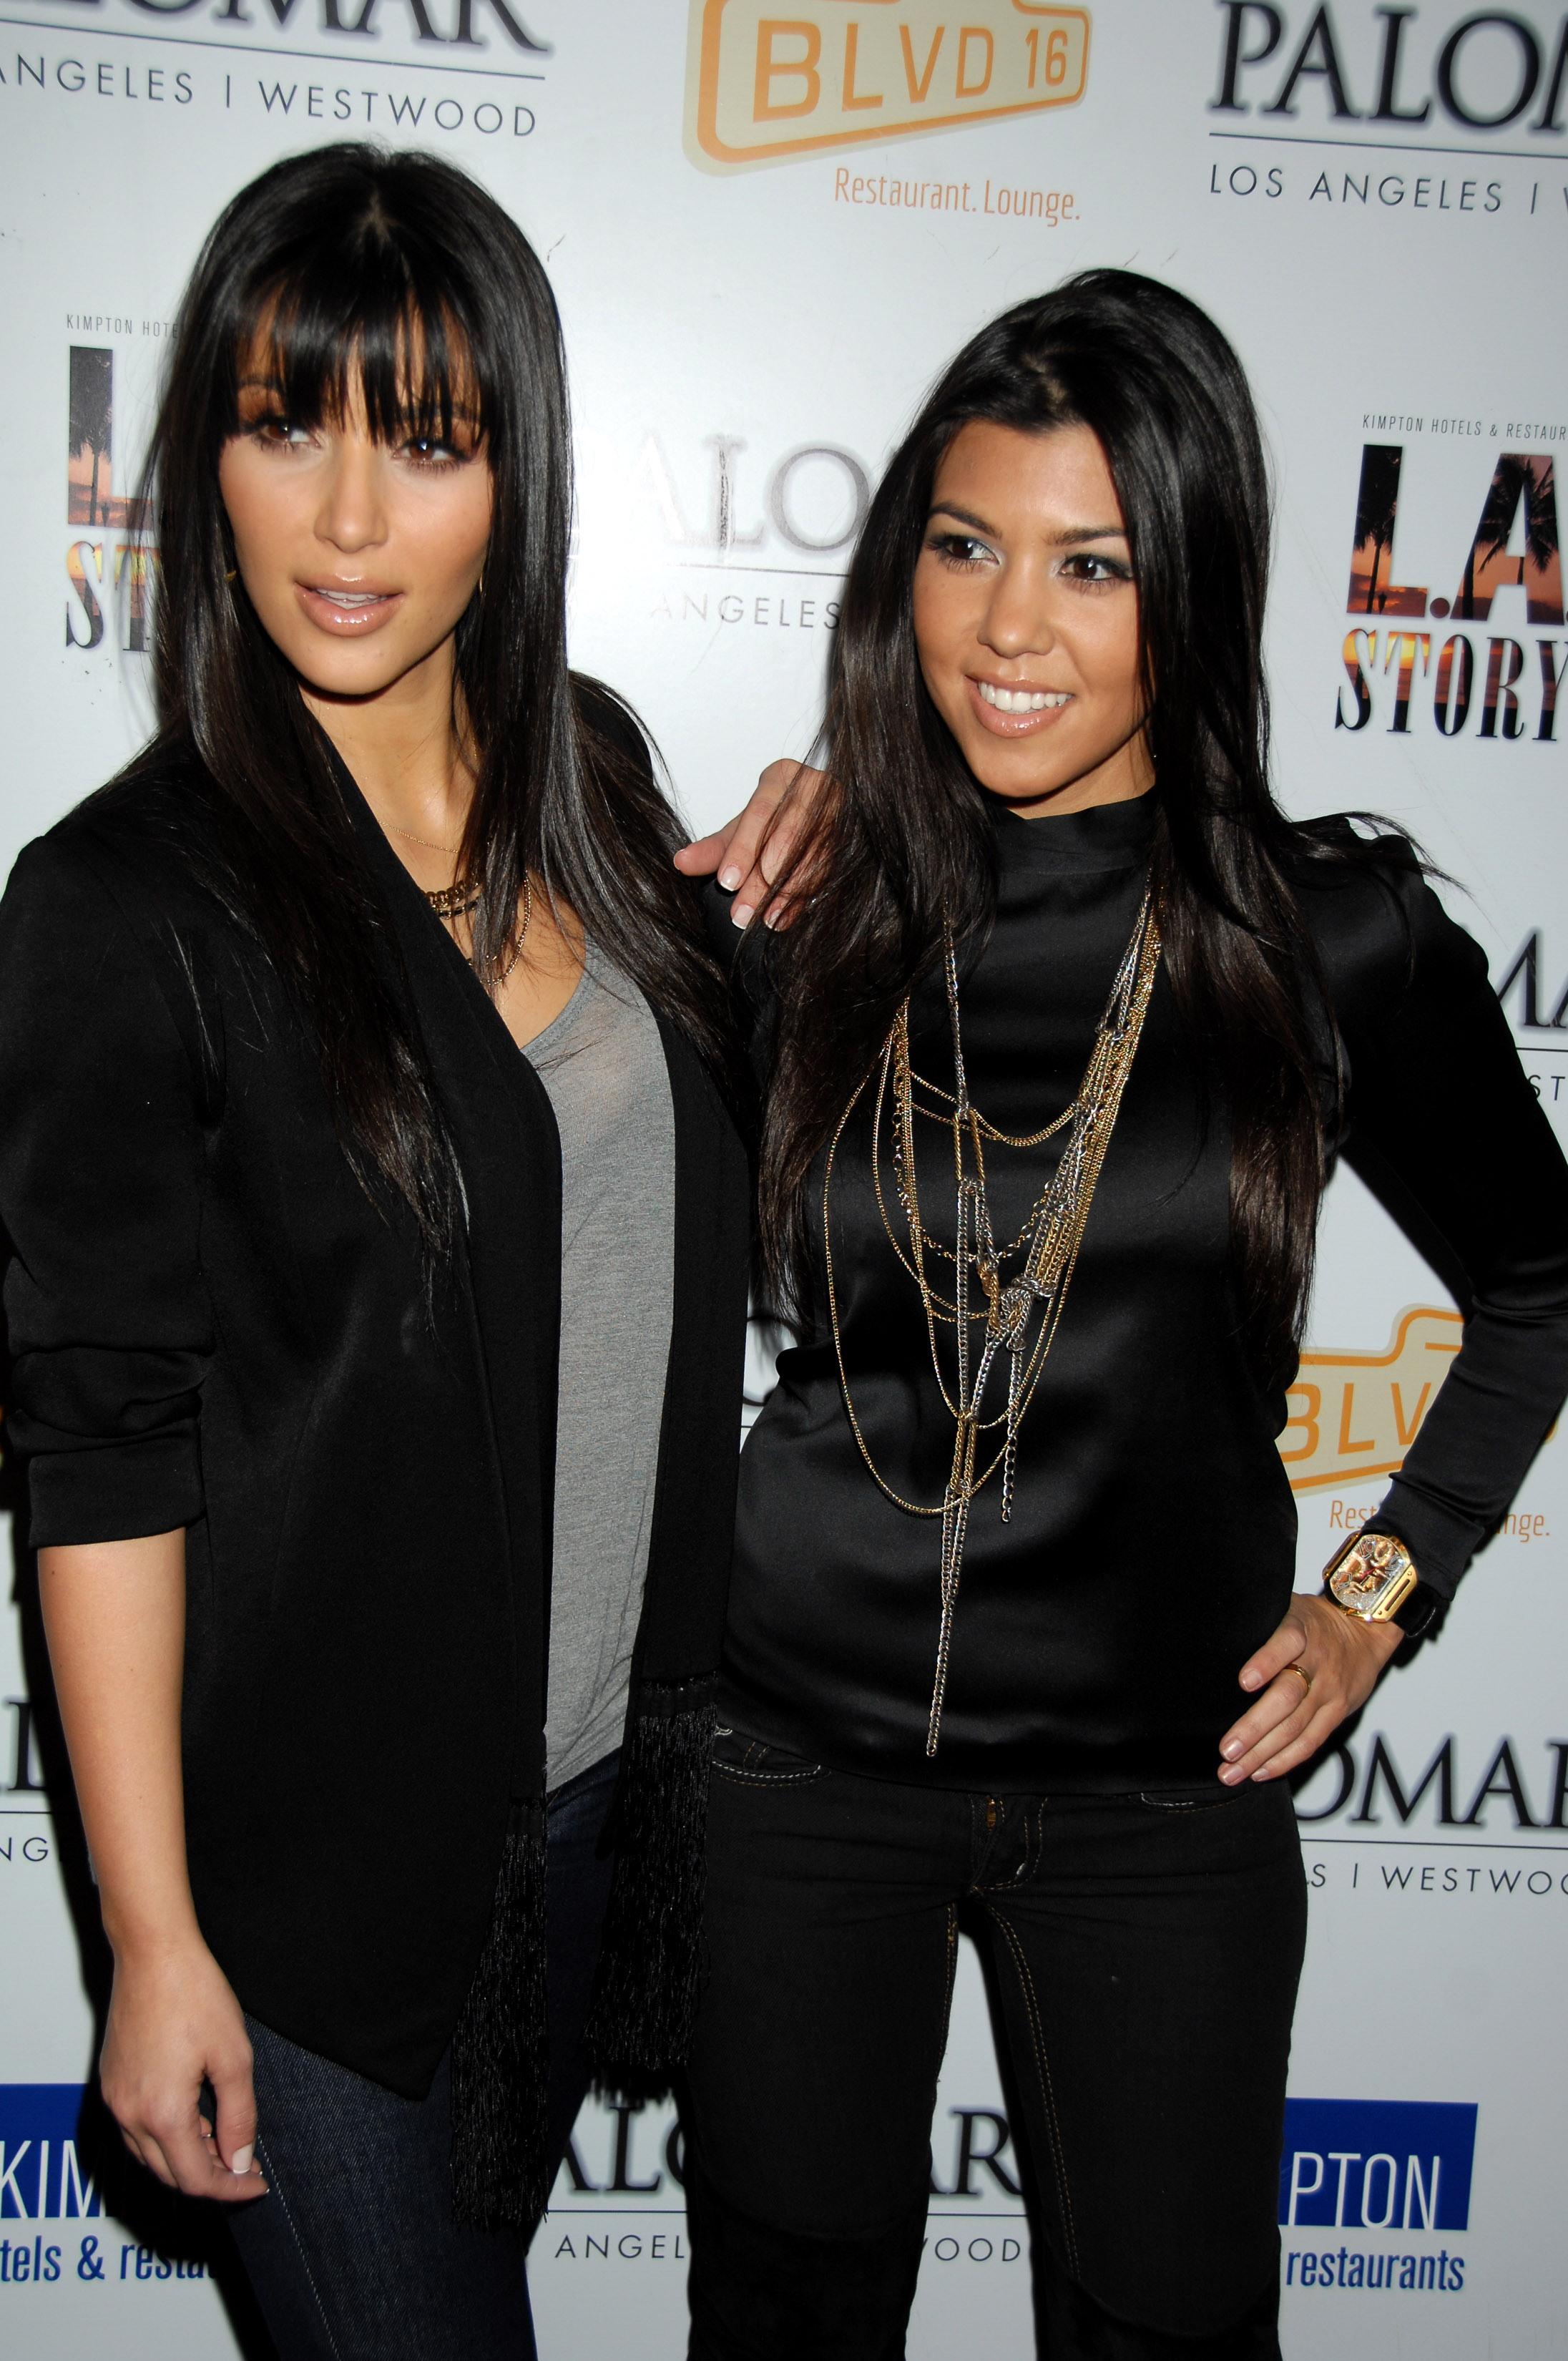 03321_Kim_Kardashian_2008-12-08_-_A_Night_For_Change_benefiting_Alternative_Intervention_Models_in_LA_352_122_572lo.jpg